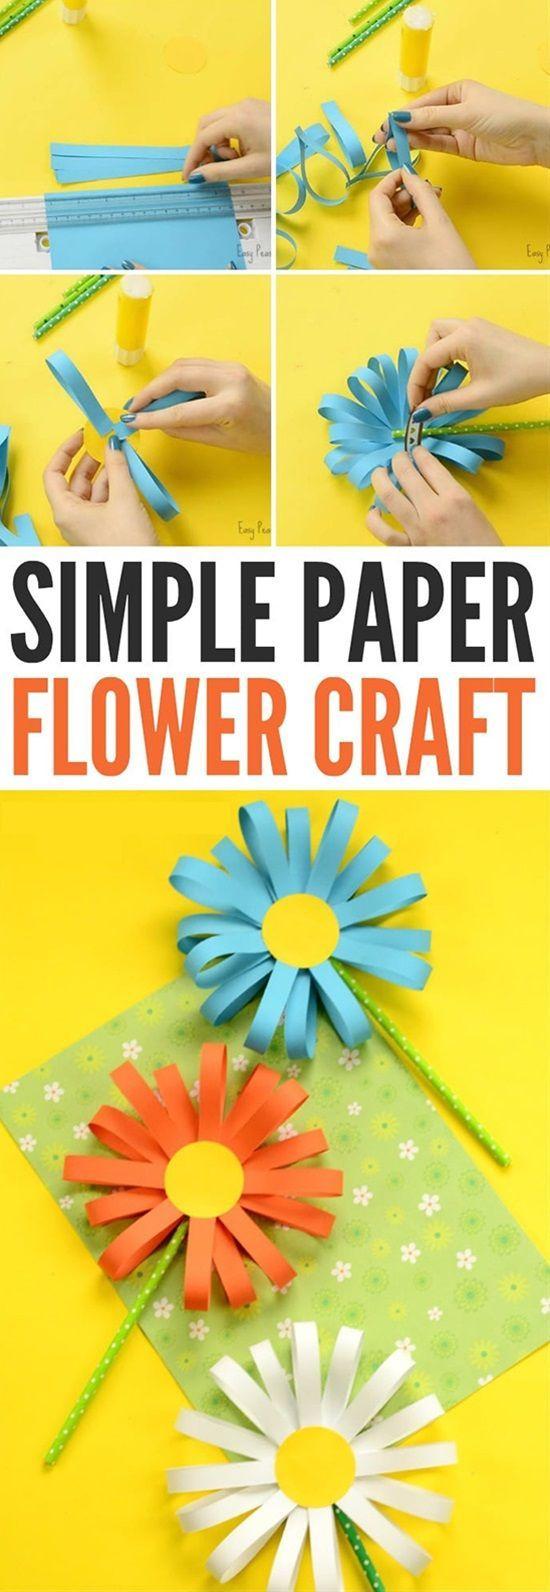 15 Amazing Diy Paper Crafts Tutorials For Your Kids Diy Paper